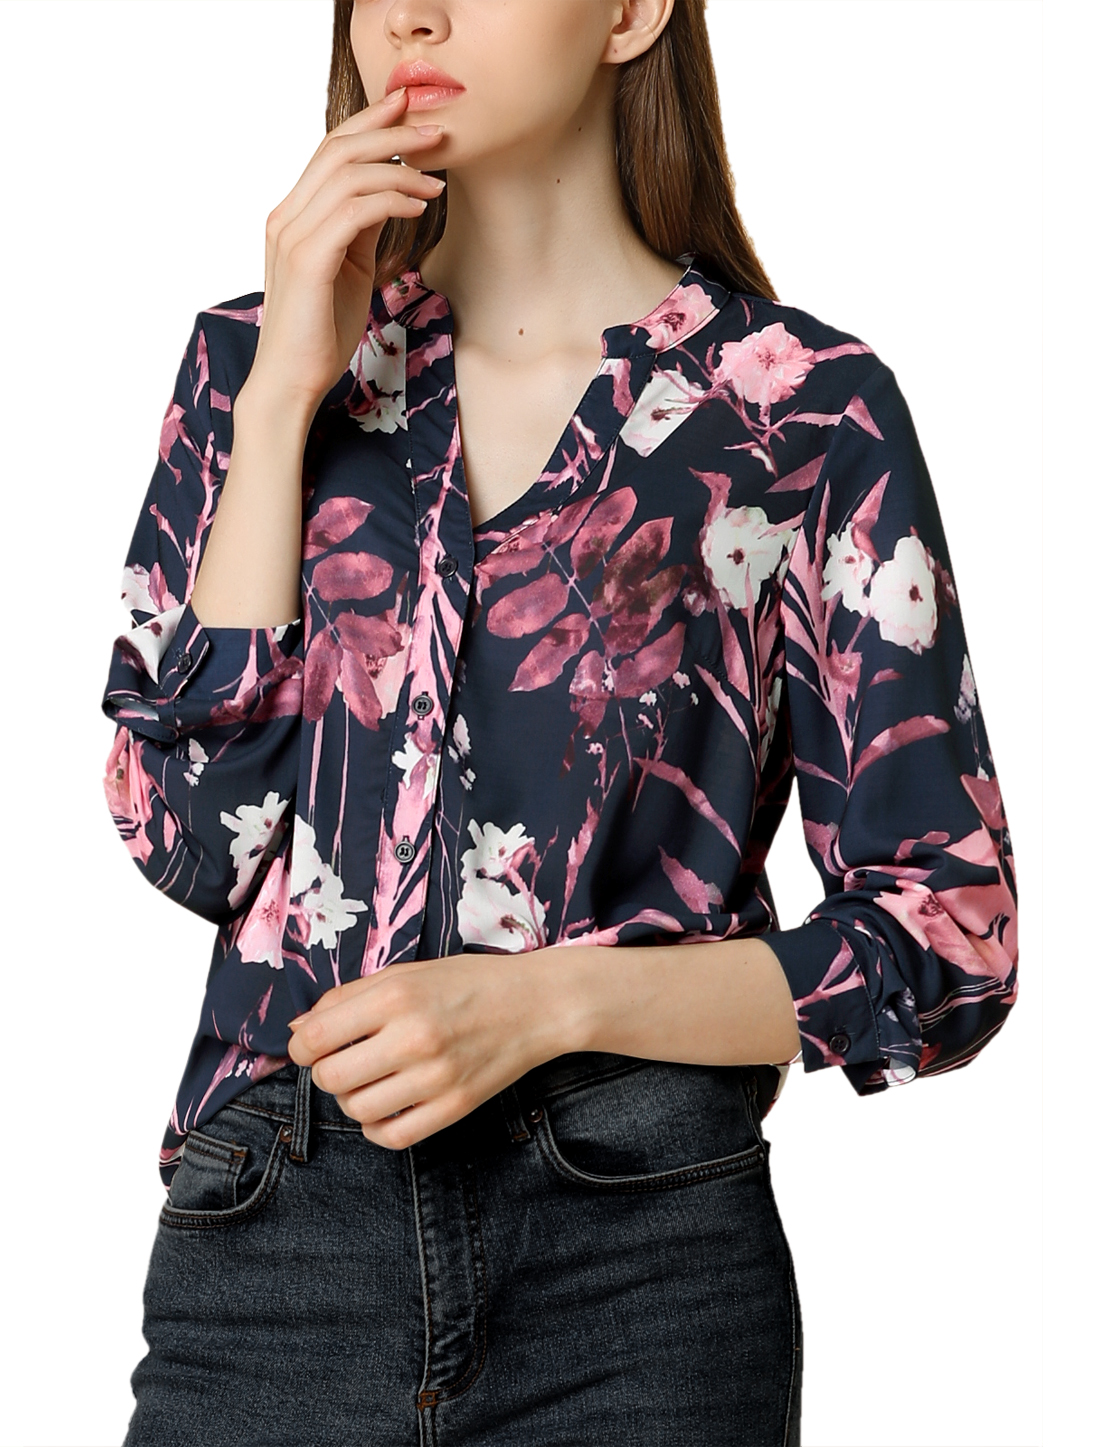 Allegra K Women's Button Down Stand Collar V Neck Floral Blouse Navy Blue L